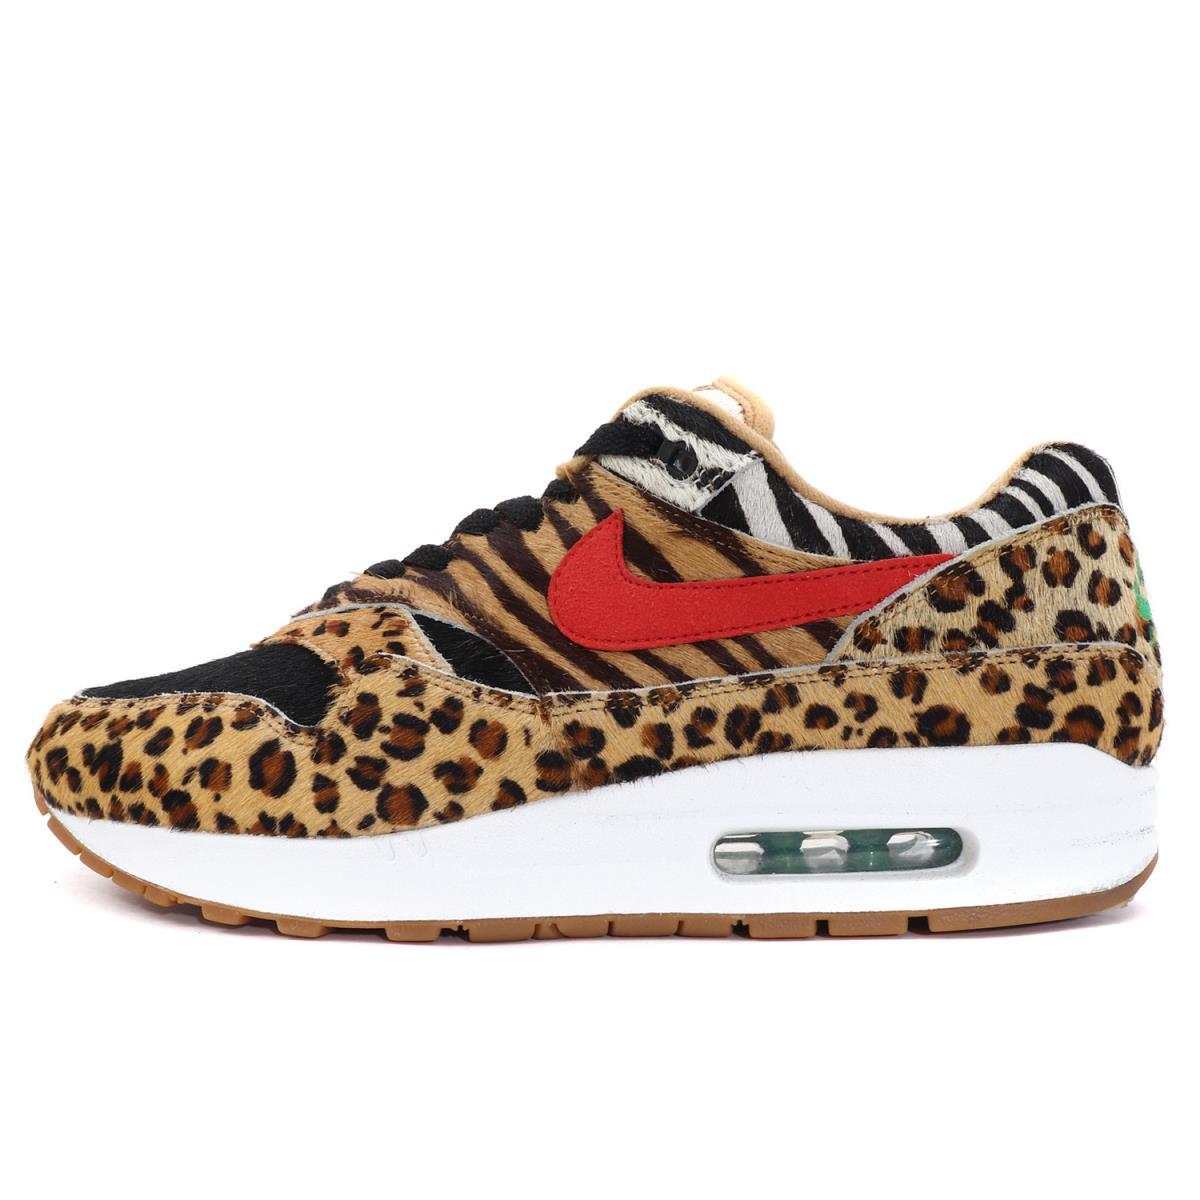 "Nike Air Max 1 DLX x Atmos ""Animal Pack 2.0"" Men's Shoe"